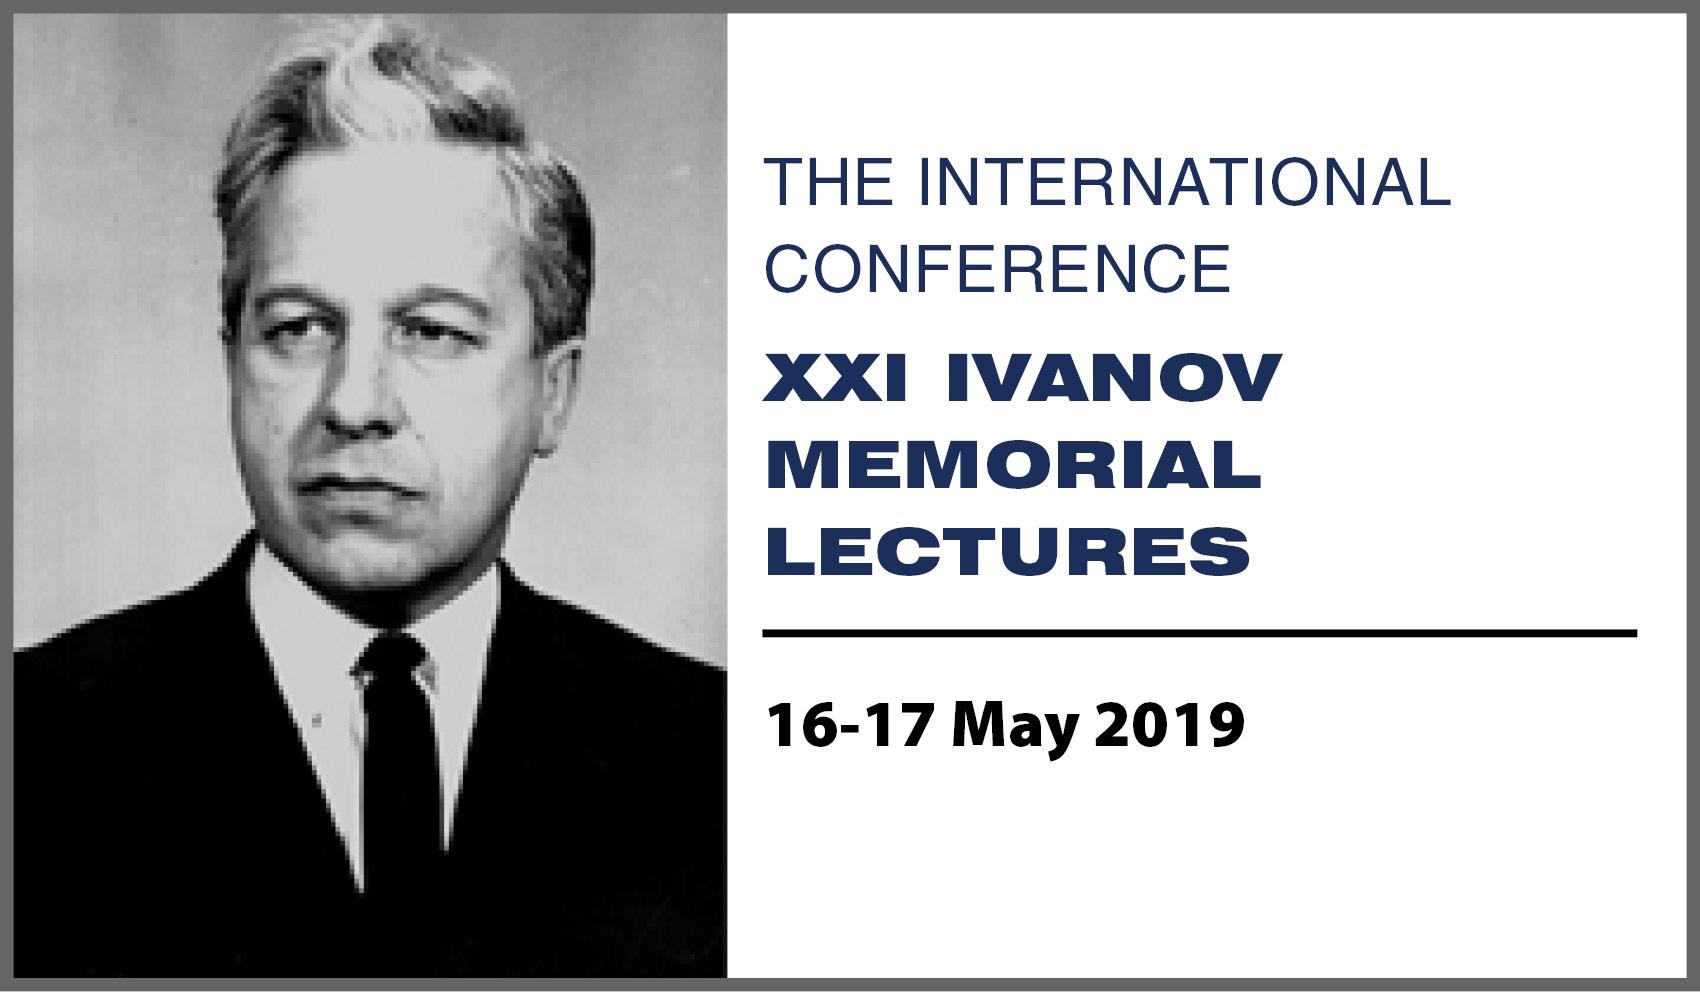 XXI Ivanov Memorial Lectures